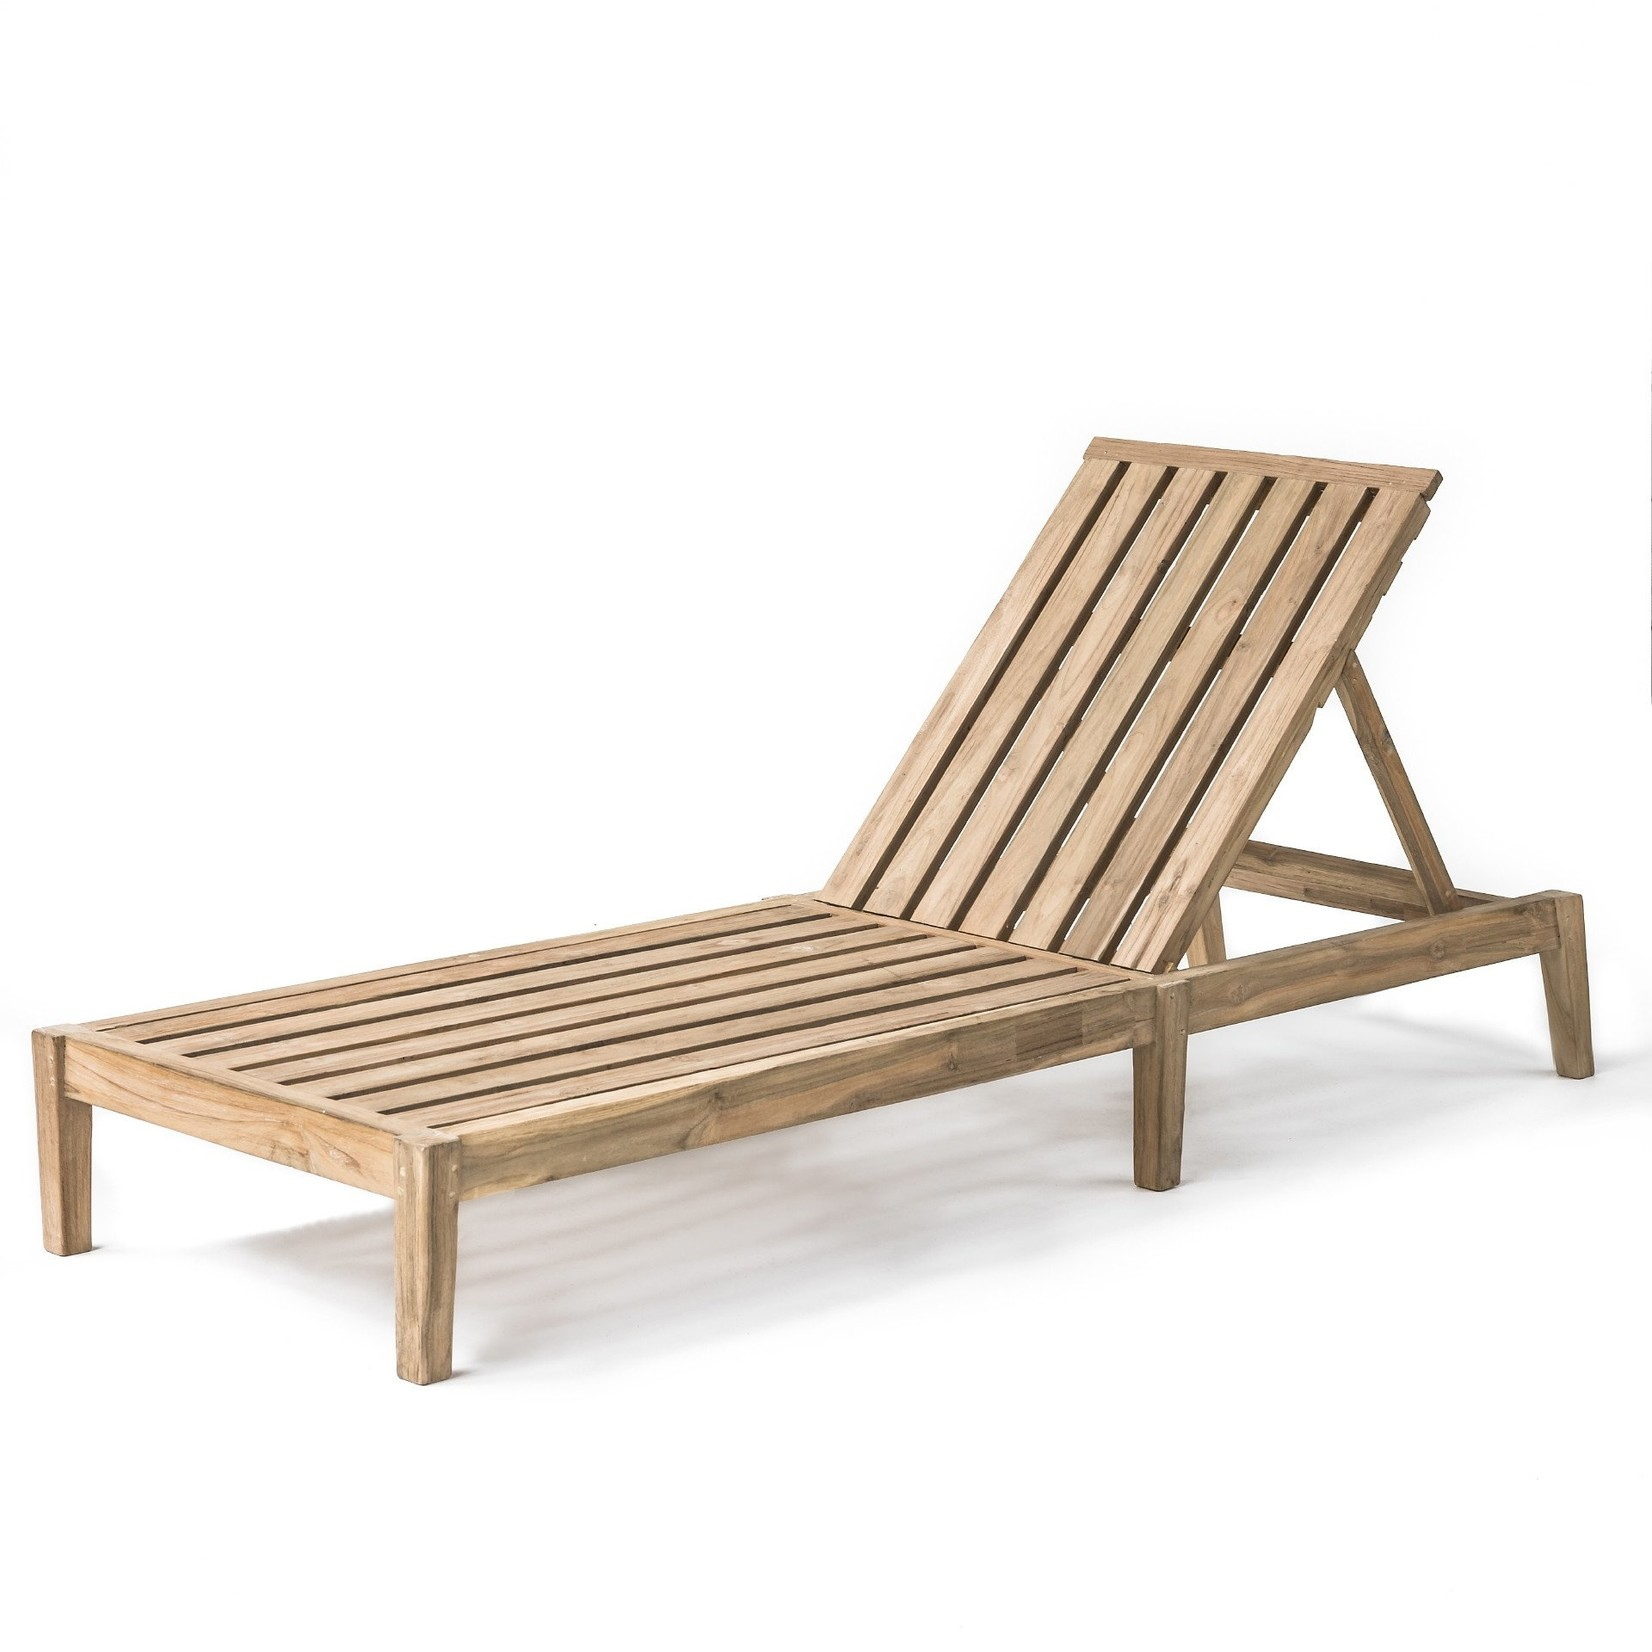 Gommaire Sunny Bed Copenhague | Reclaimed Teak Natural Grey + Cushion